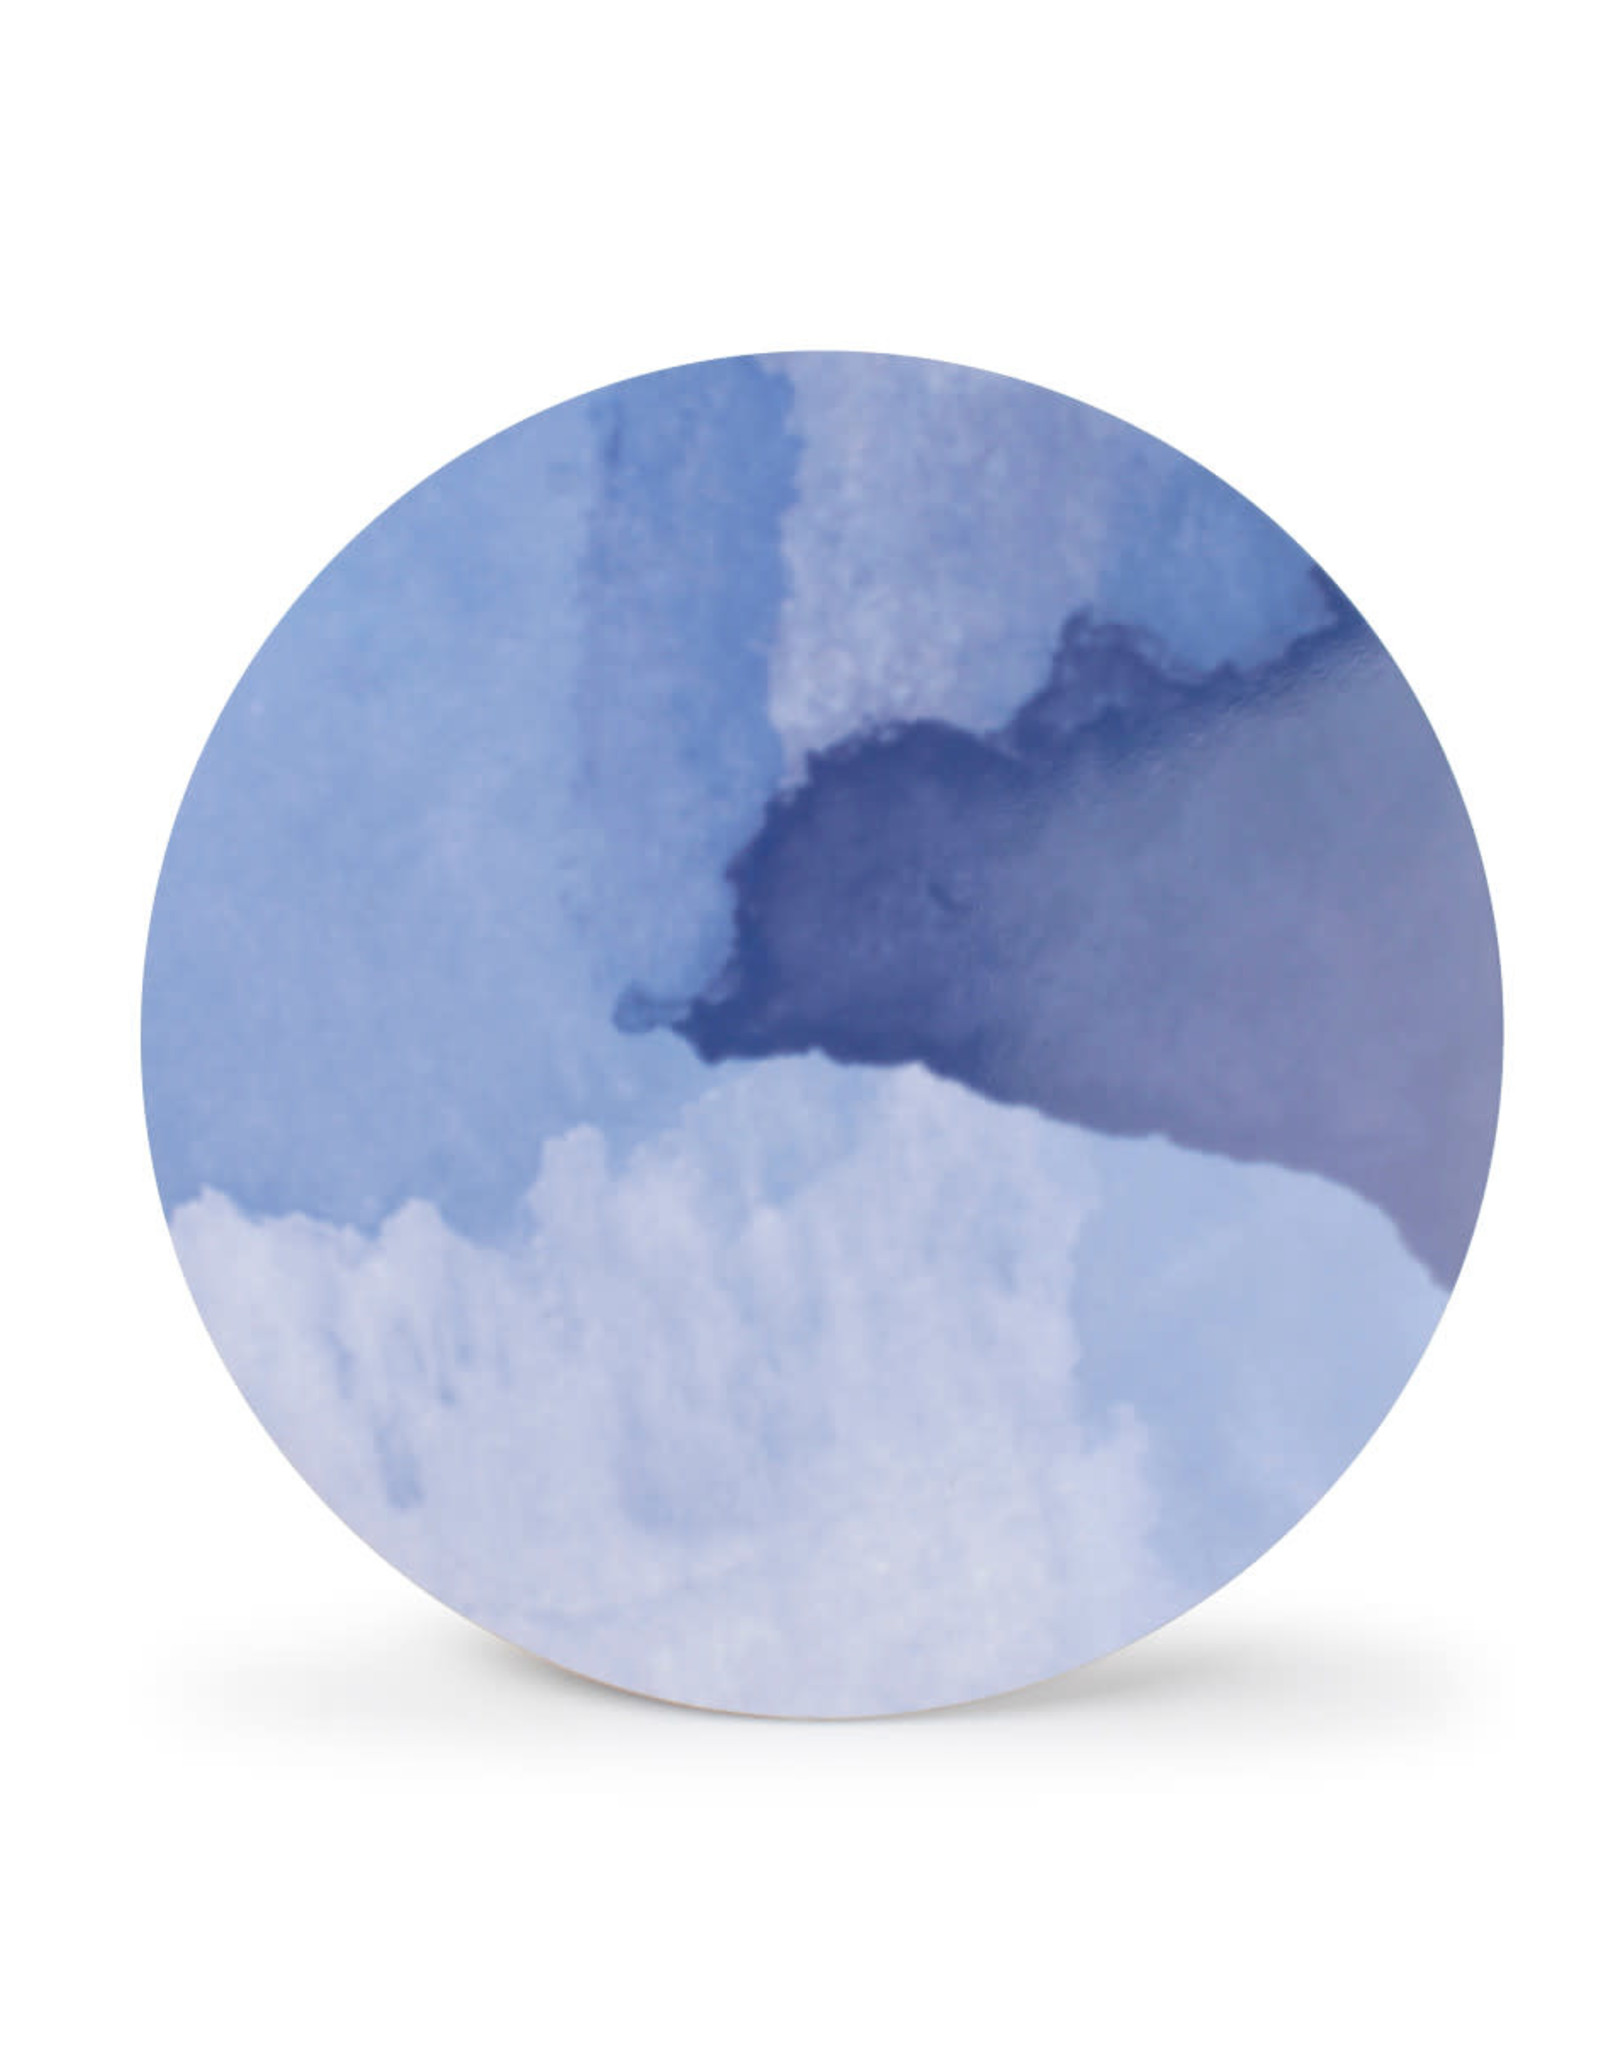 Placemat - Cloudy Sky